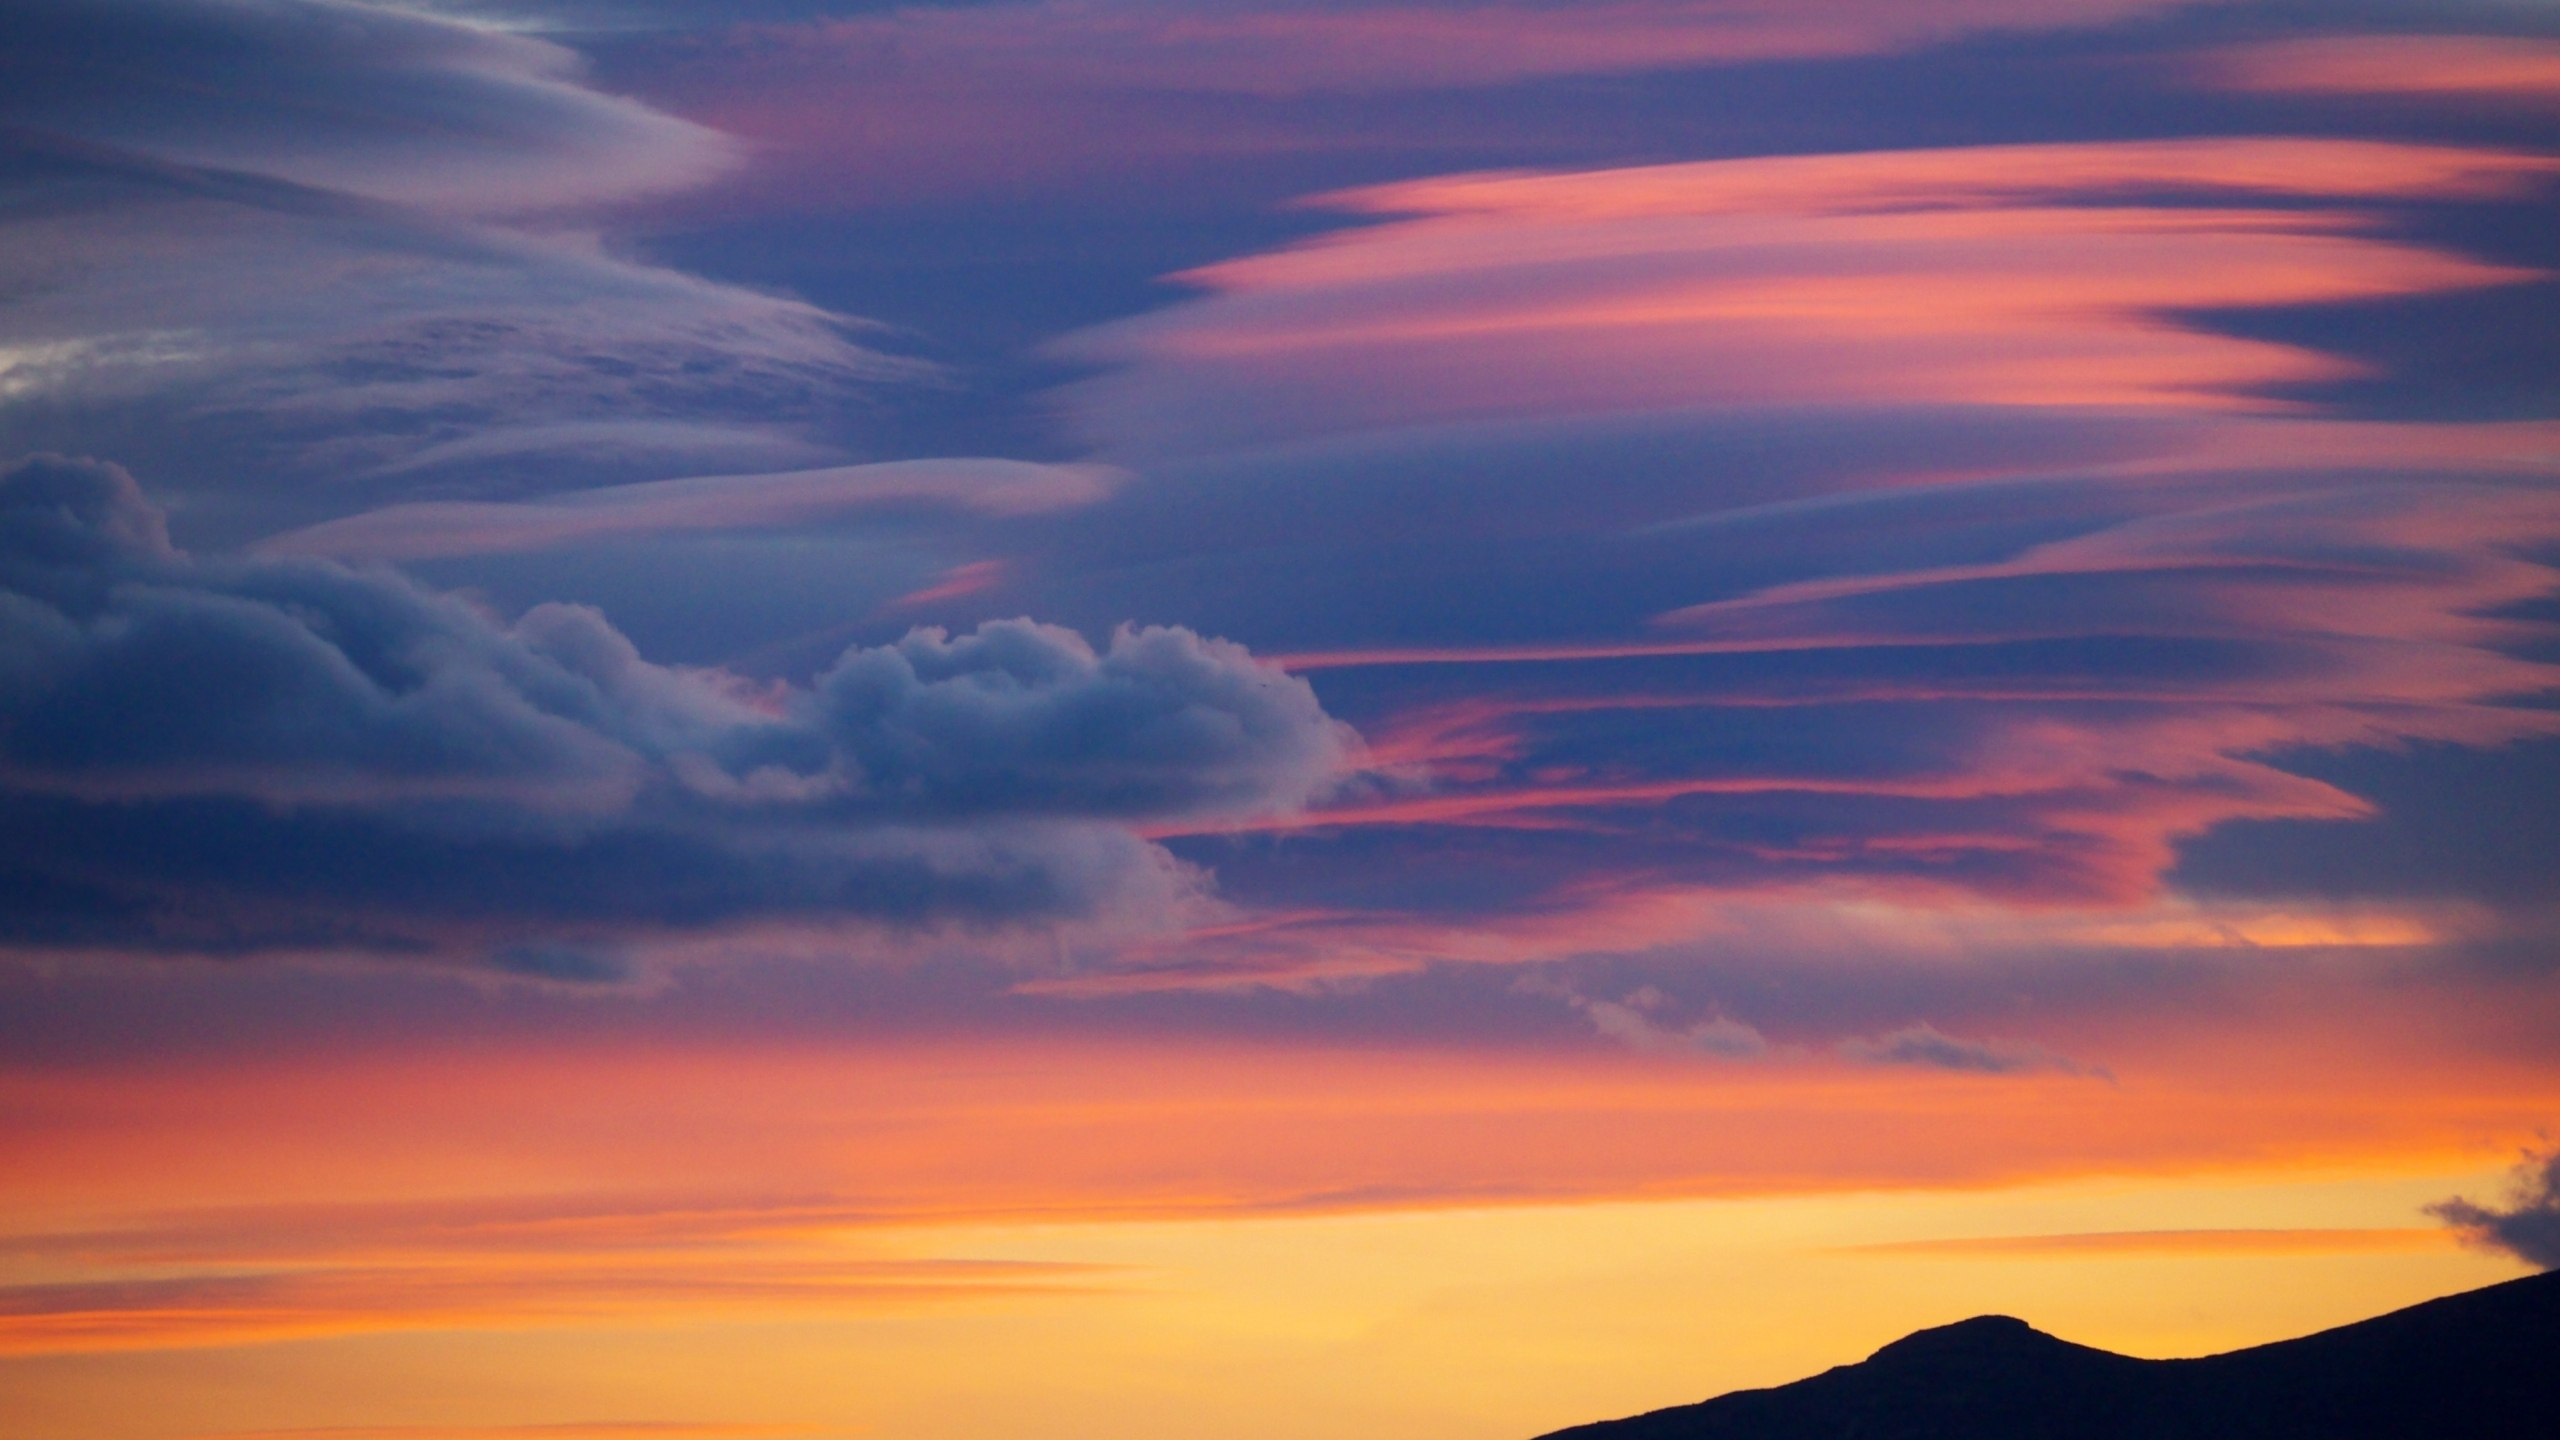 Evening Cloud Mac Wallpaper Download Mac Wallpapers Download 2560x1440